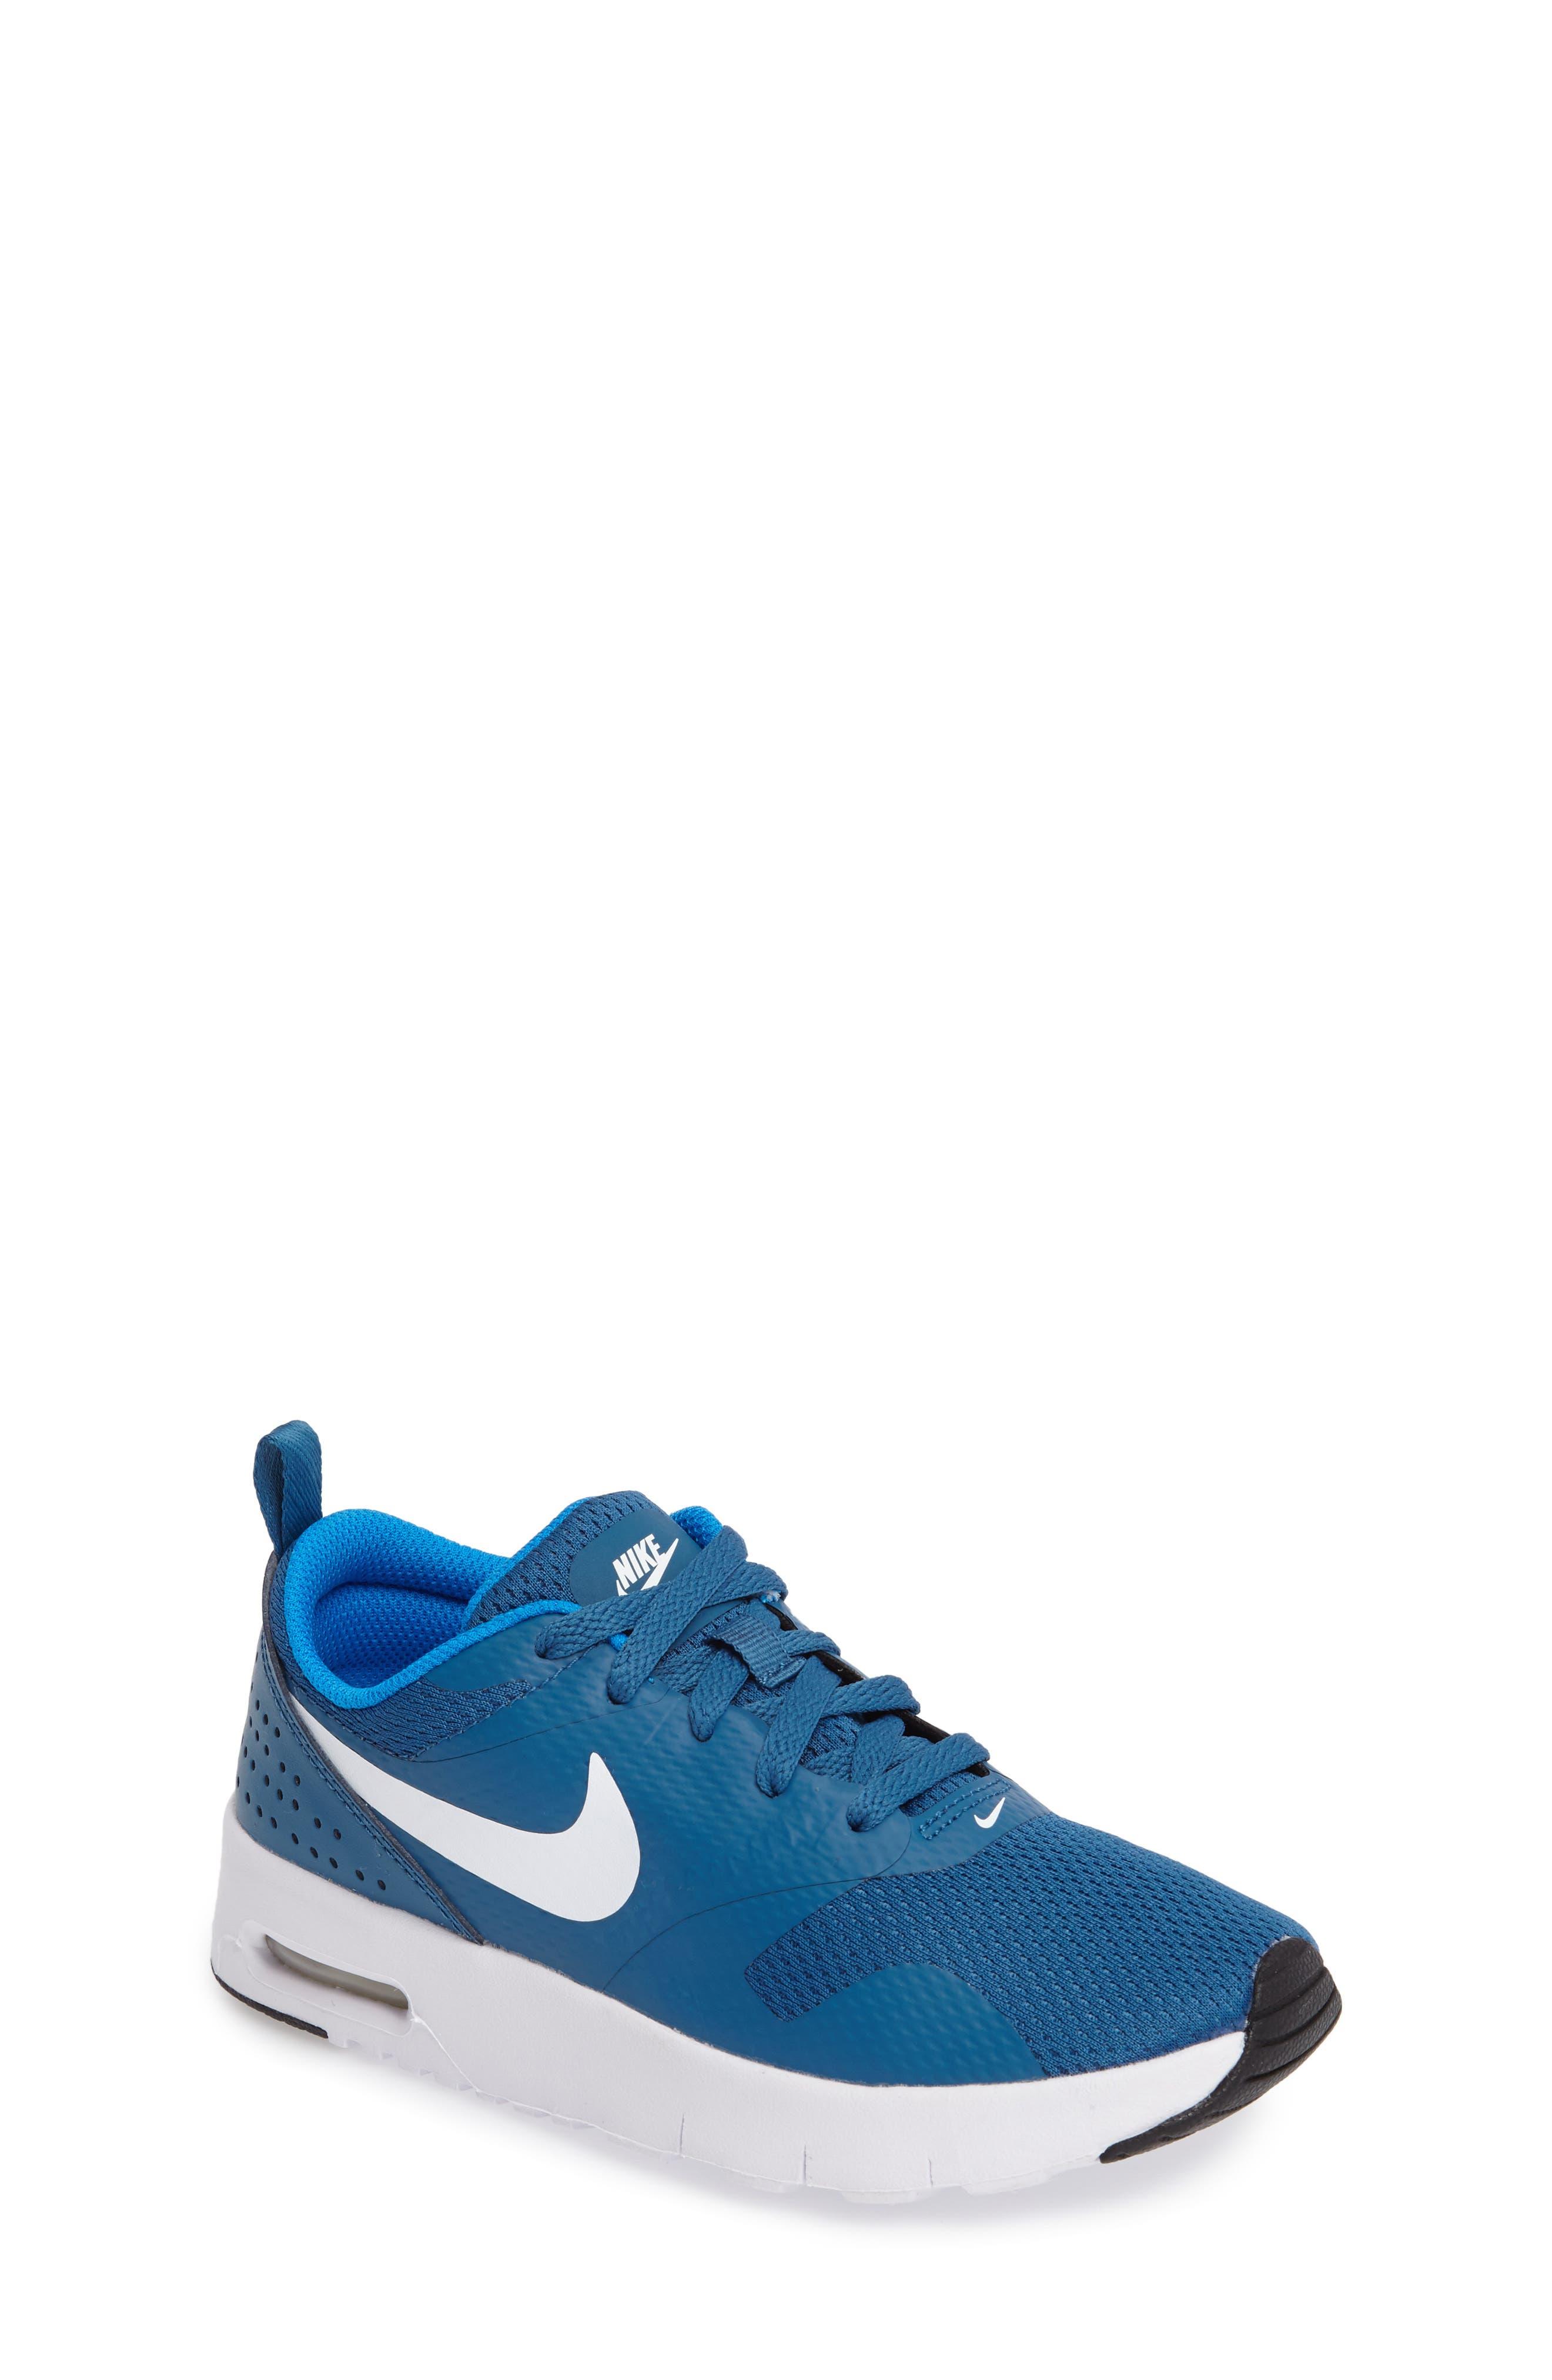 Nike Air Max Tavas Sneaker (Walker, Toddler & Little Kid)